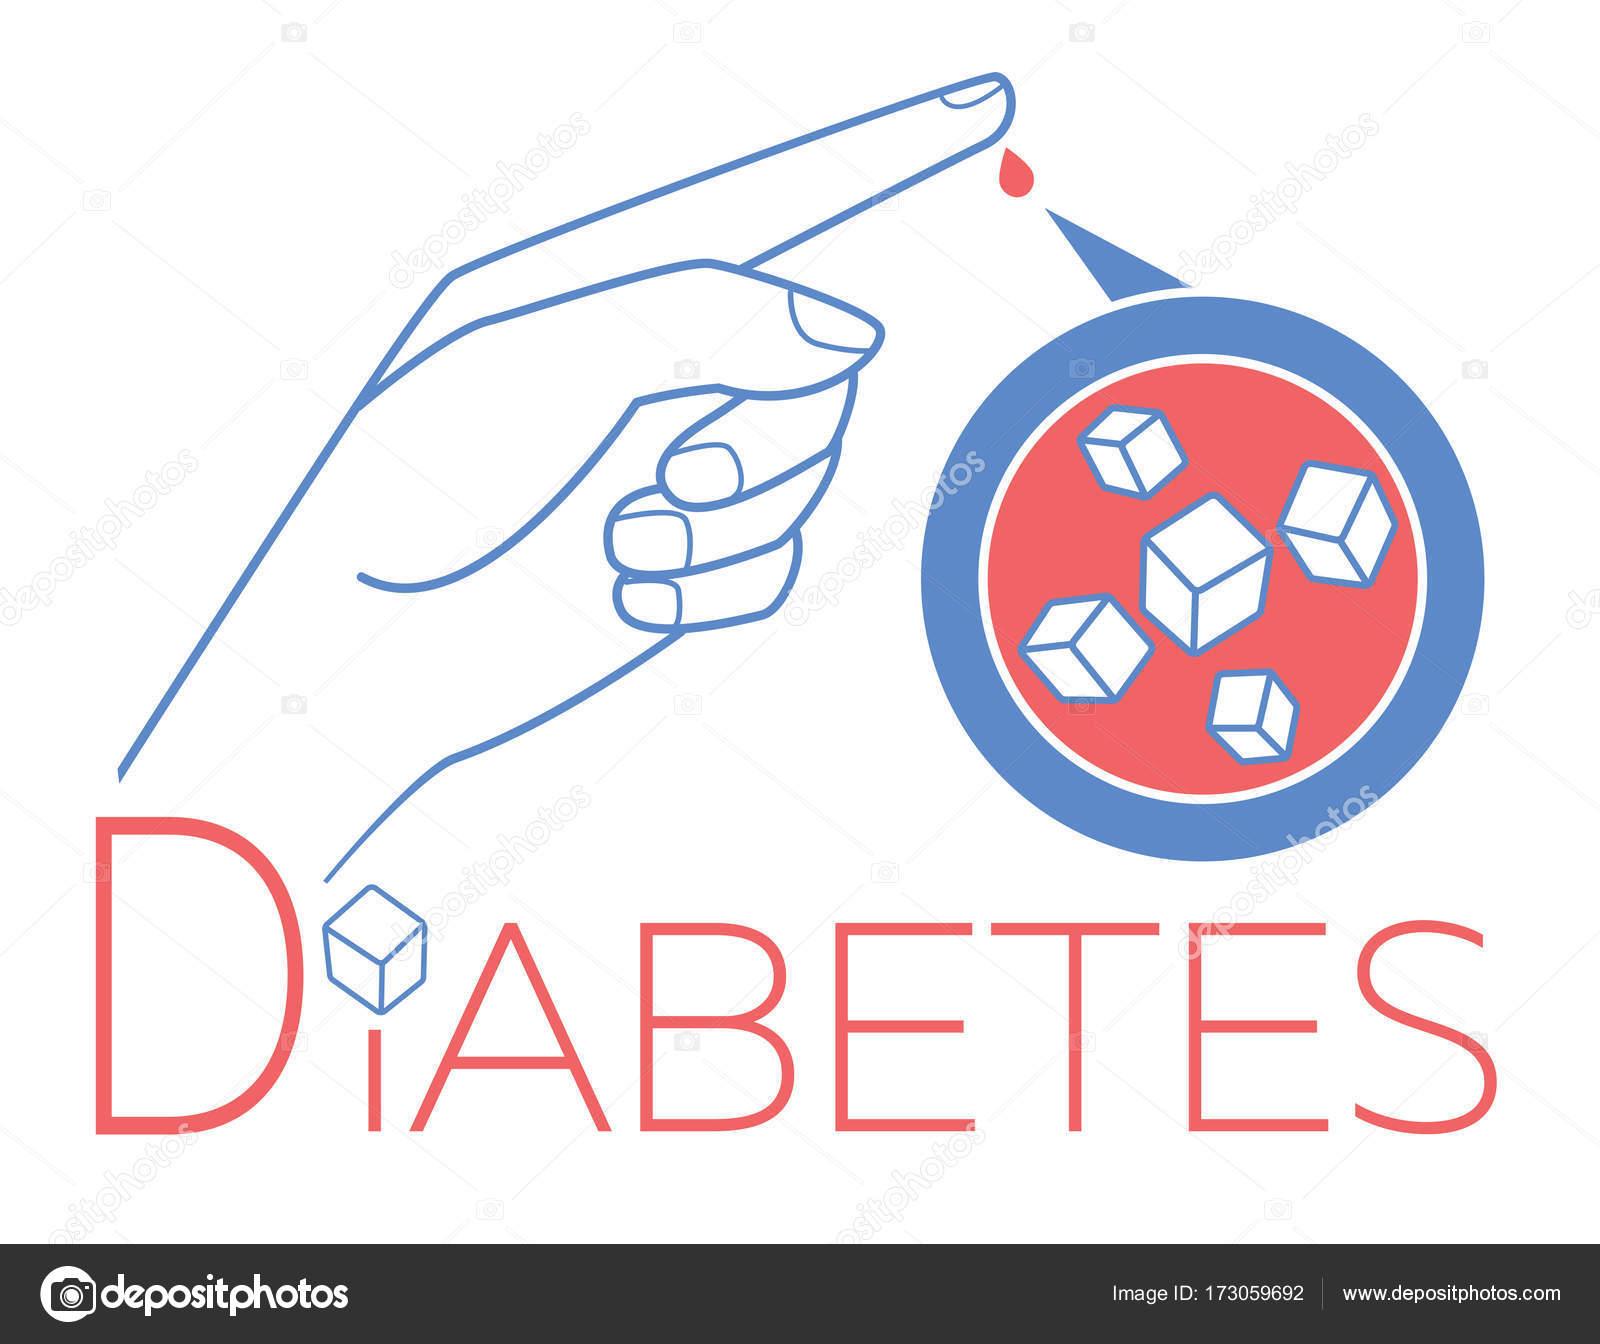 Diabetes en la sangre